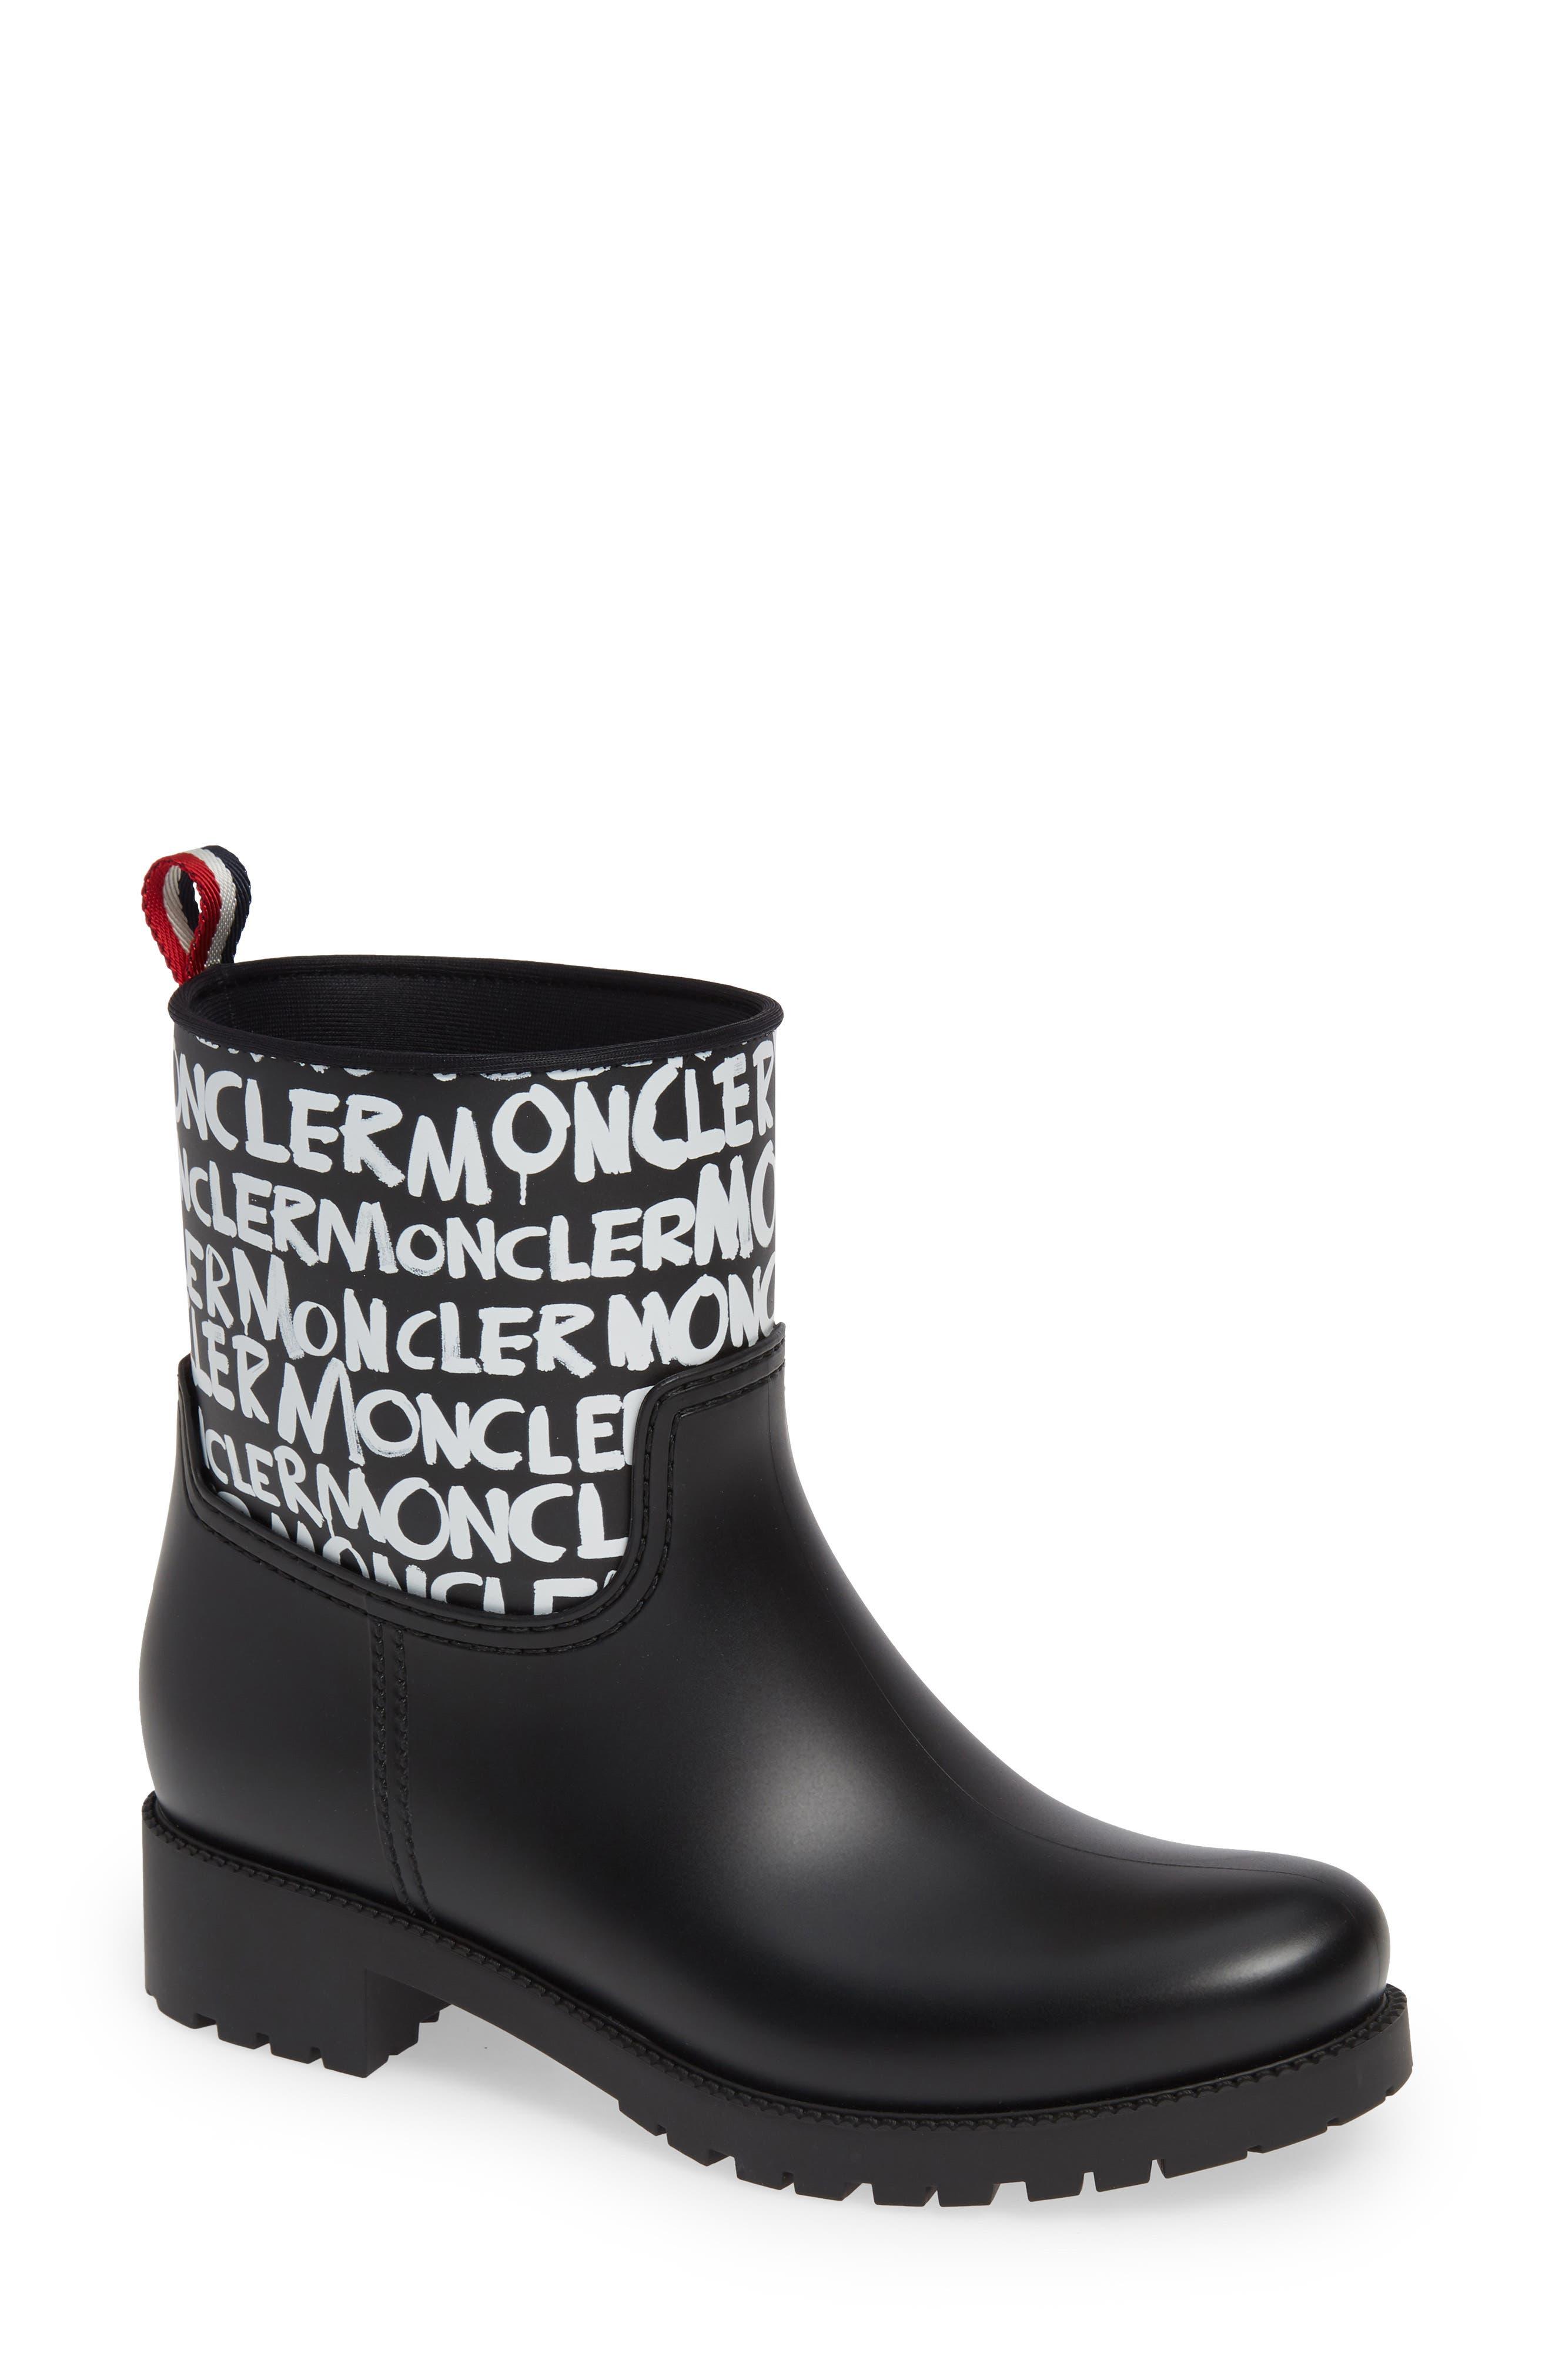 Moncler Ginette Stivale Logo Waterproof Rain Boot, Black